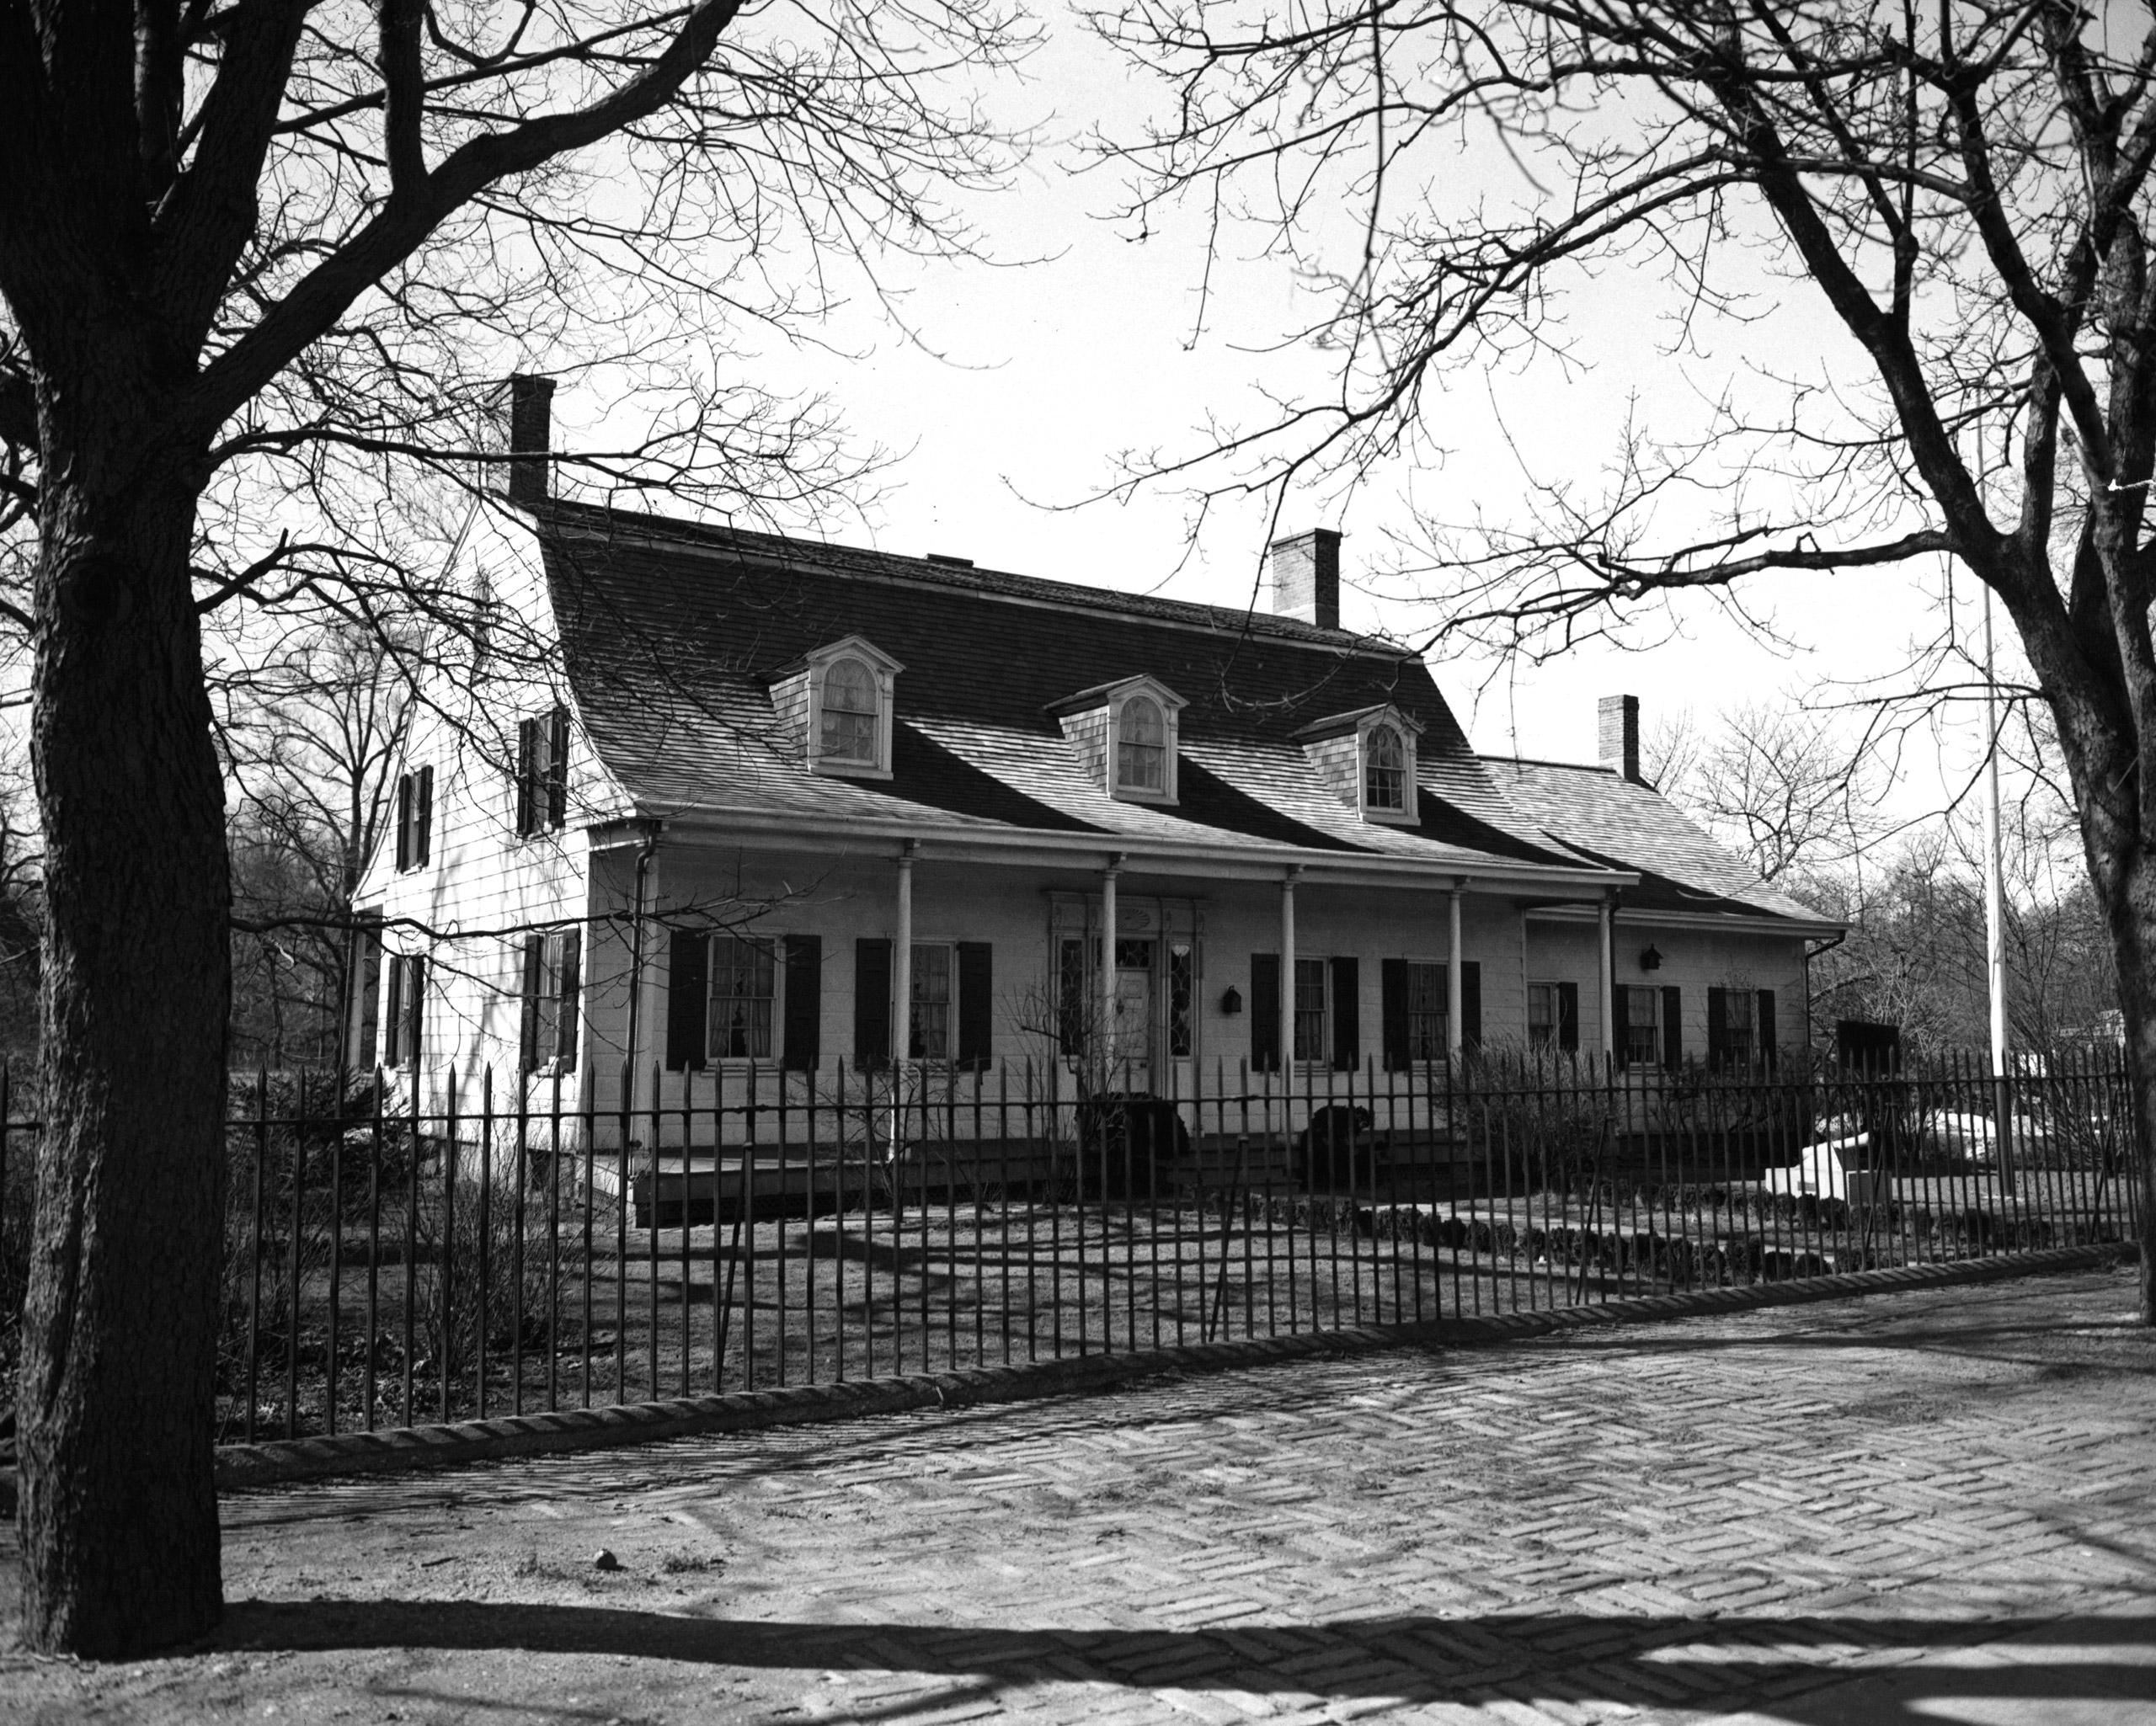 The Lefferts Homestead in Prospect Park, Brooklyn, 1955.